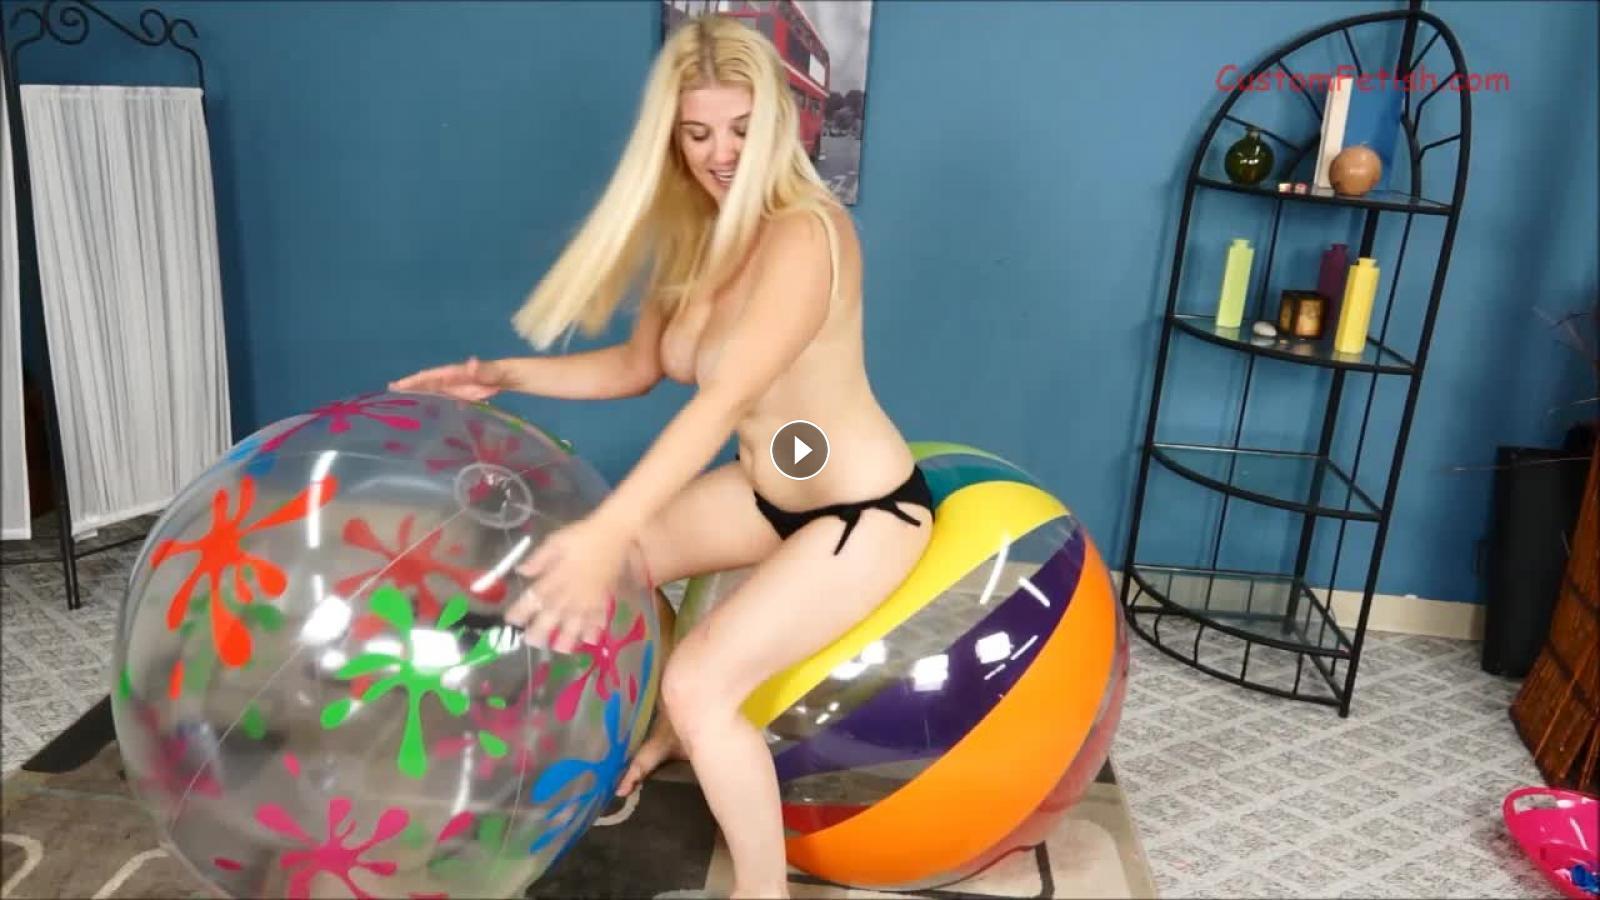 Inflatable fetish pics